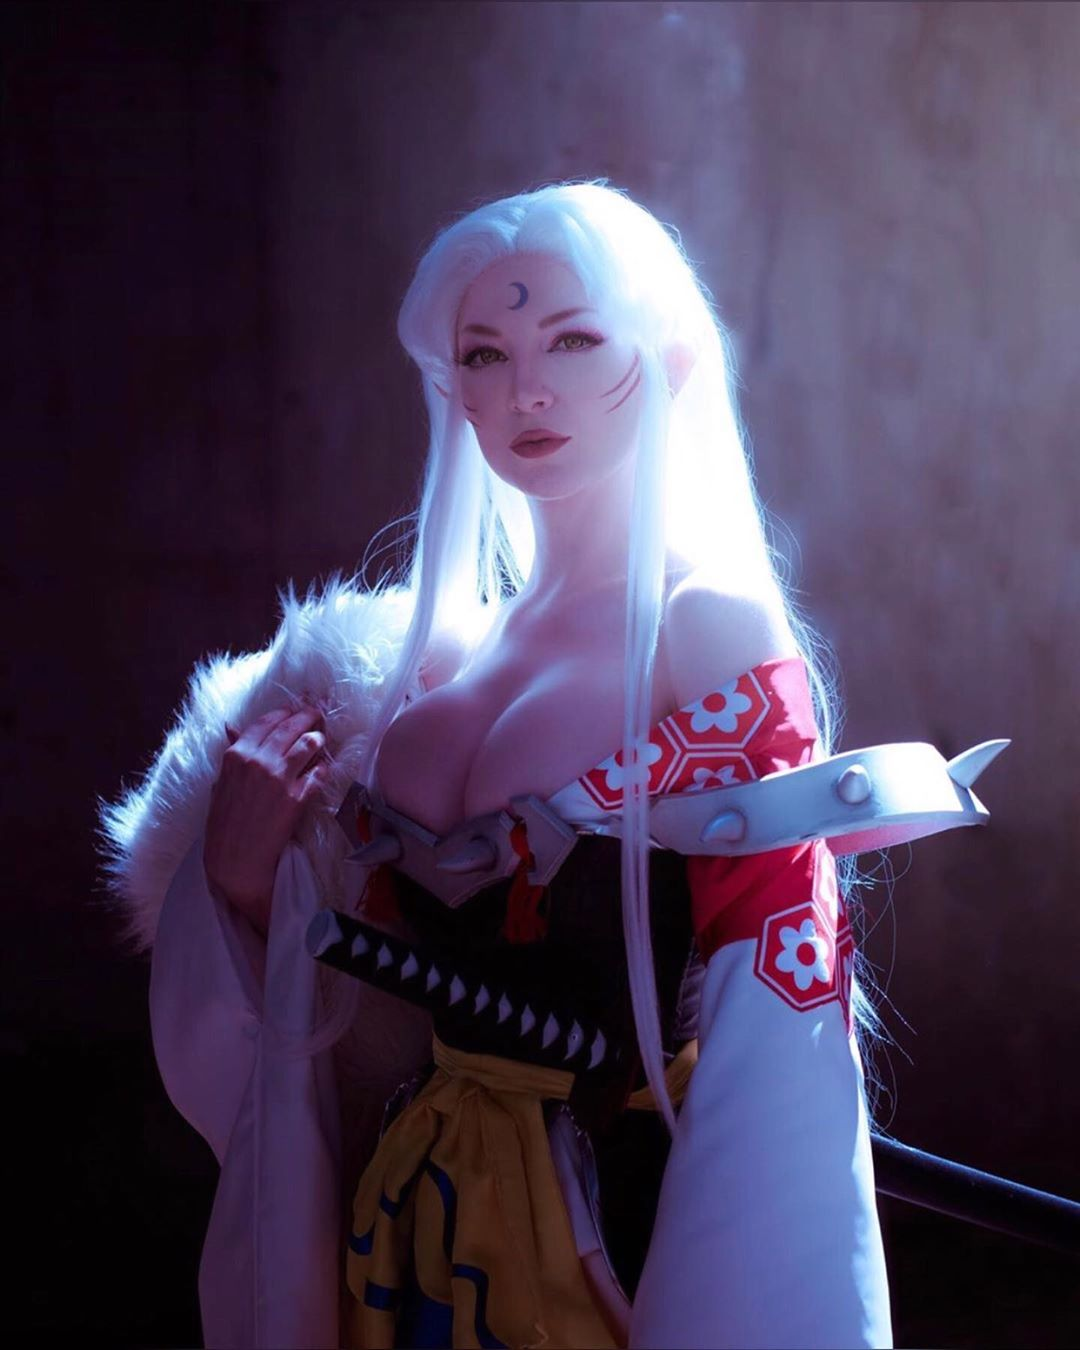 Sesshomaru cosplay by Ashlynne Dae